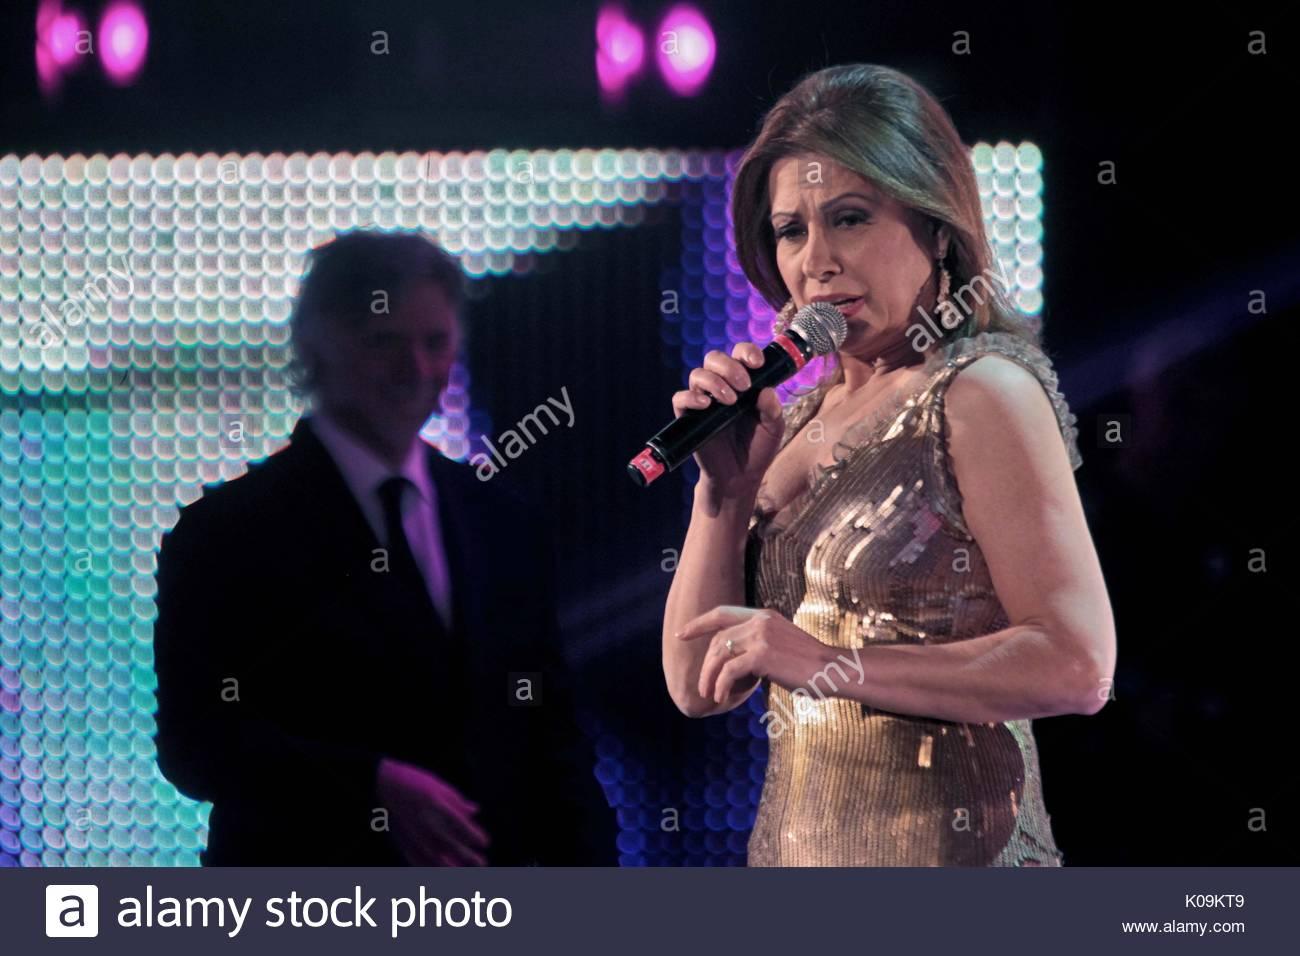 Rosina Galli (actress) Rosina Galli (actress) new images